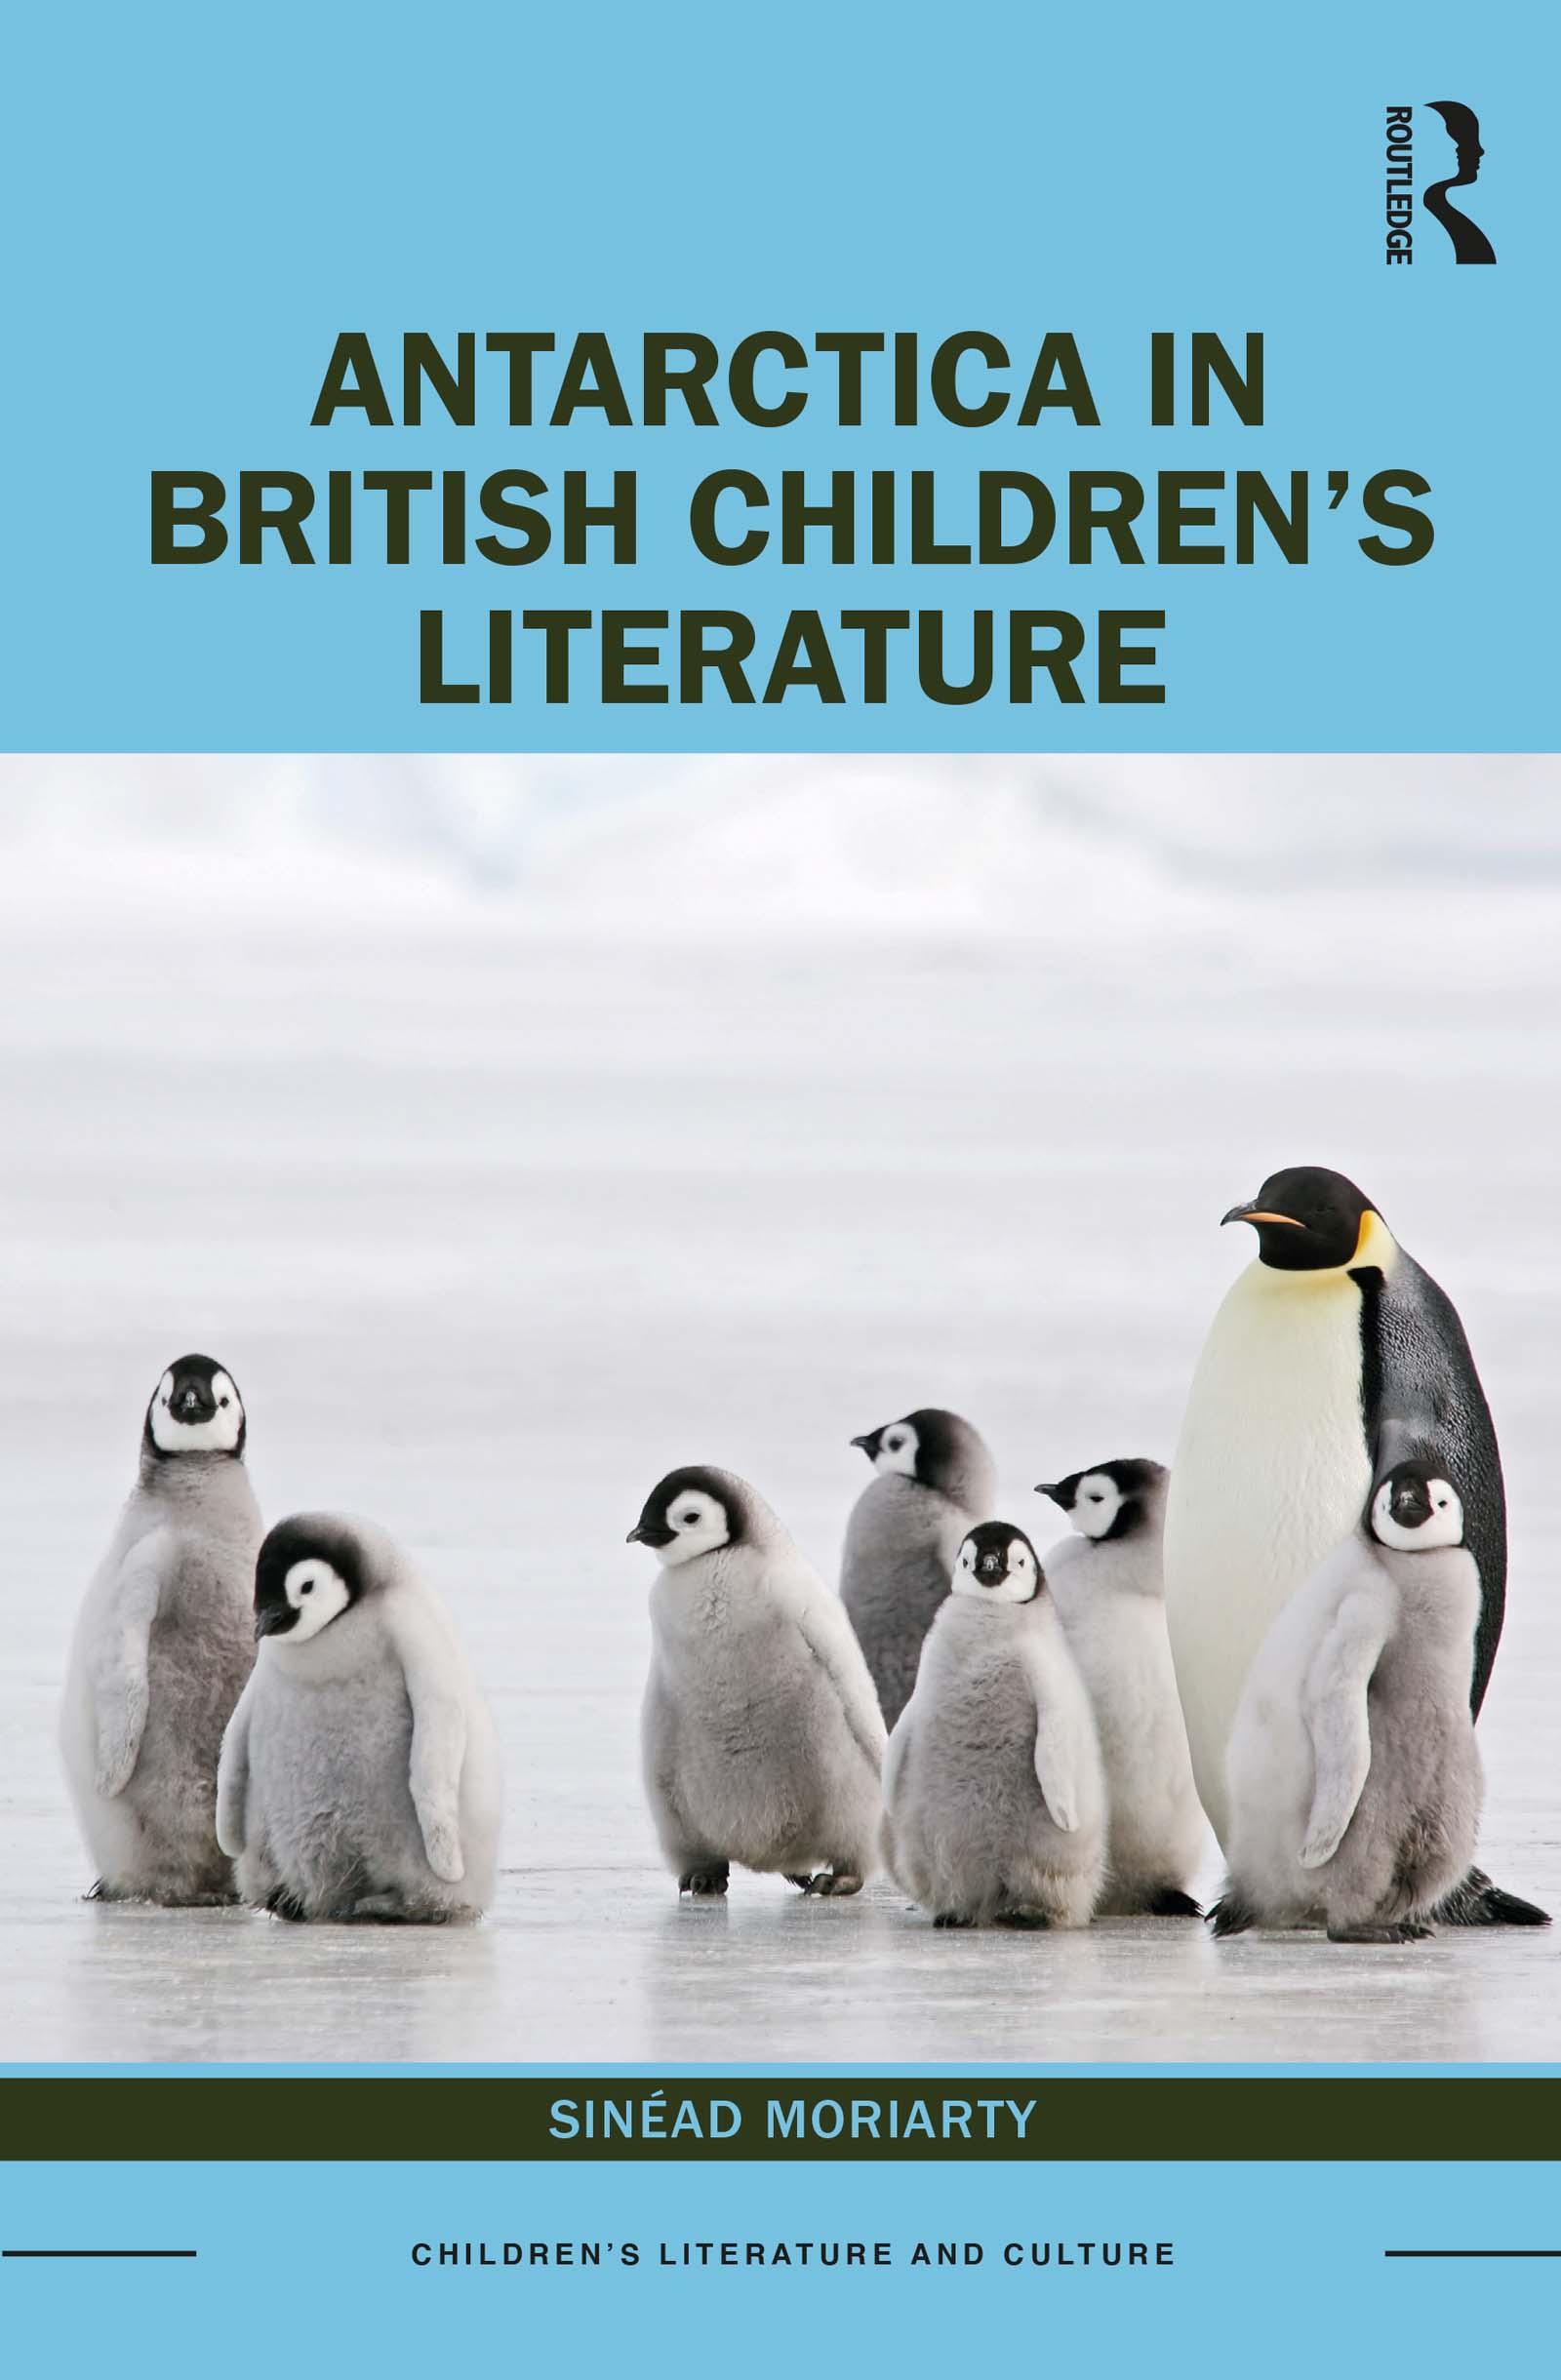 Antarctica in British Children's Literature